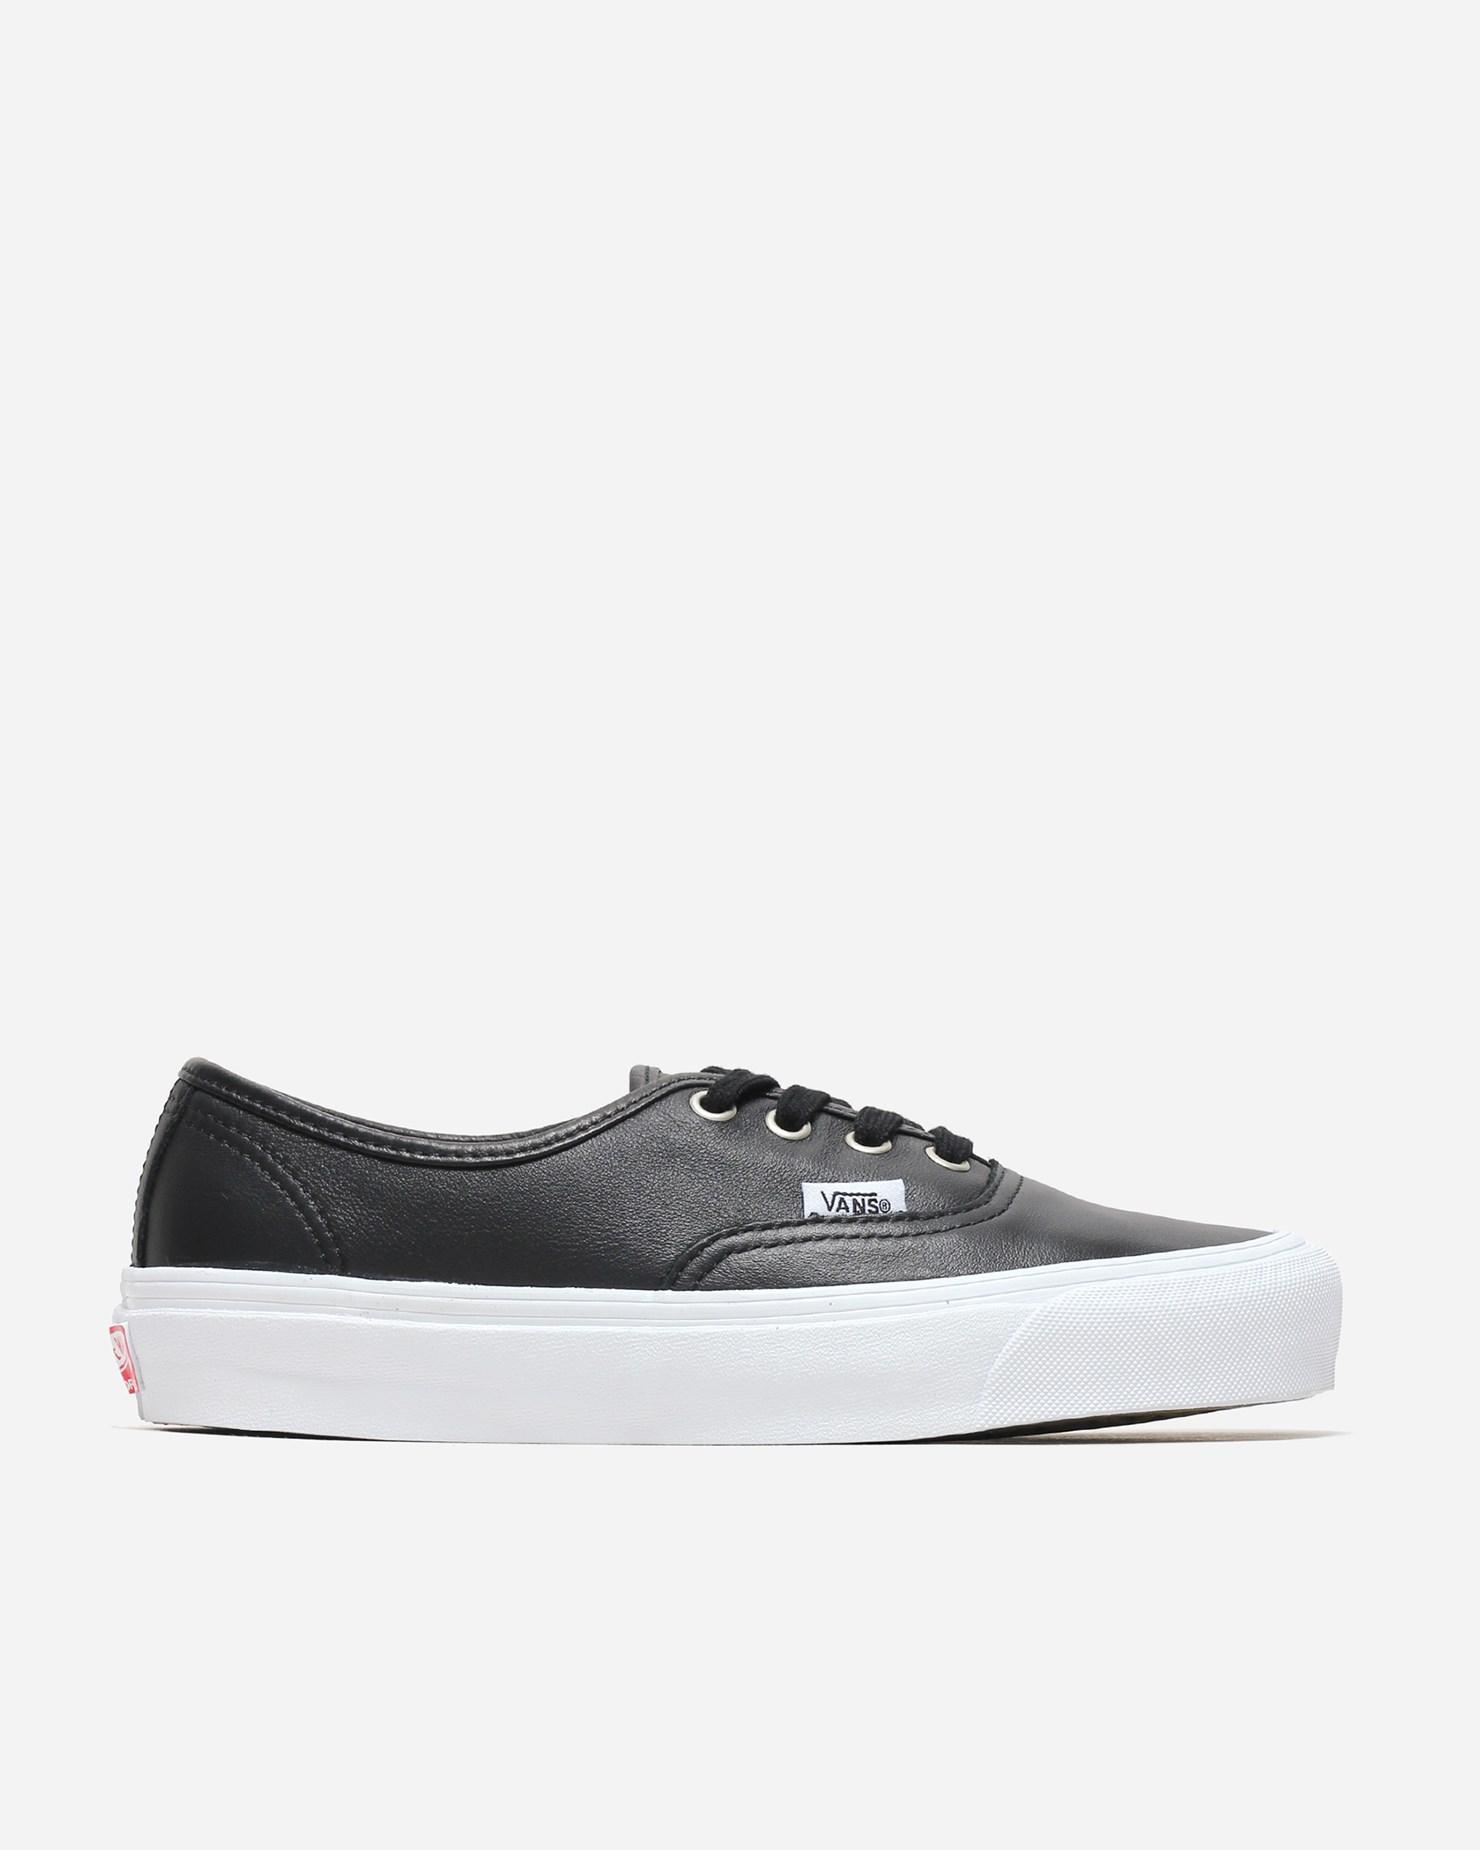 Vans OG Authentic LX - Black/True White en 2020 | Sneakers